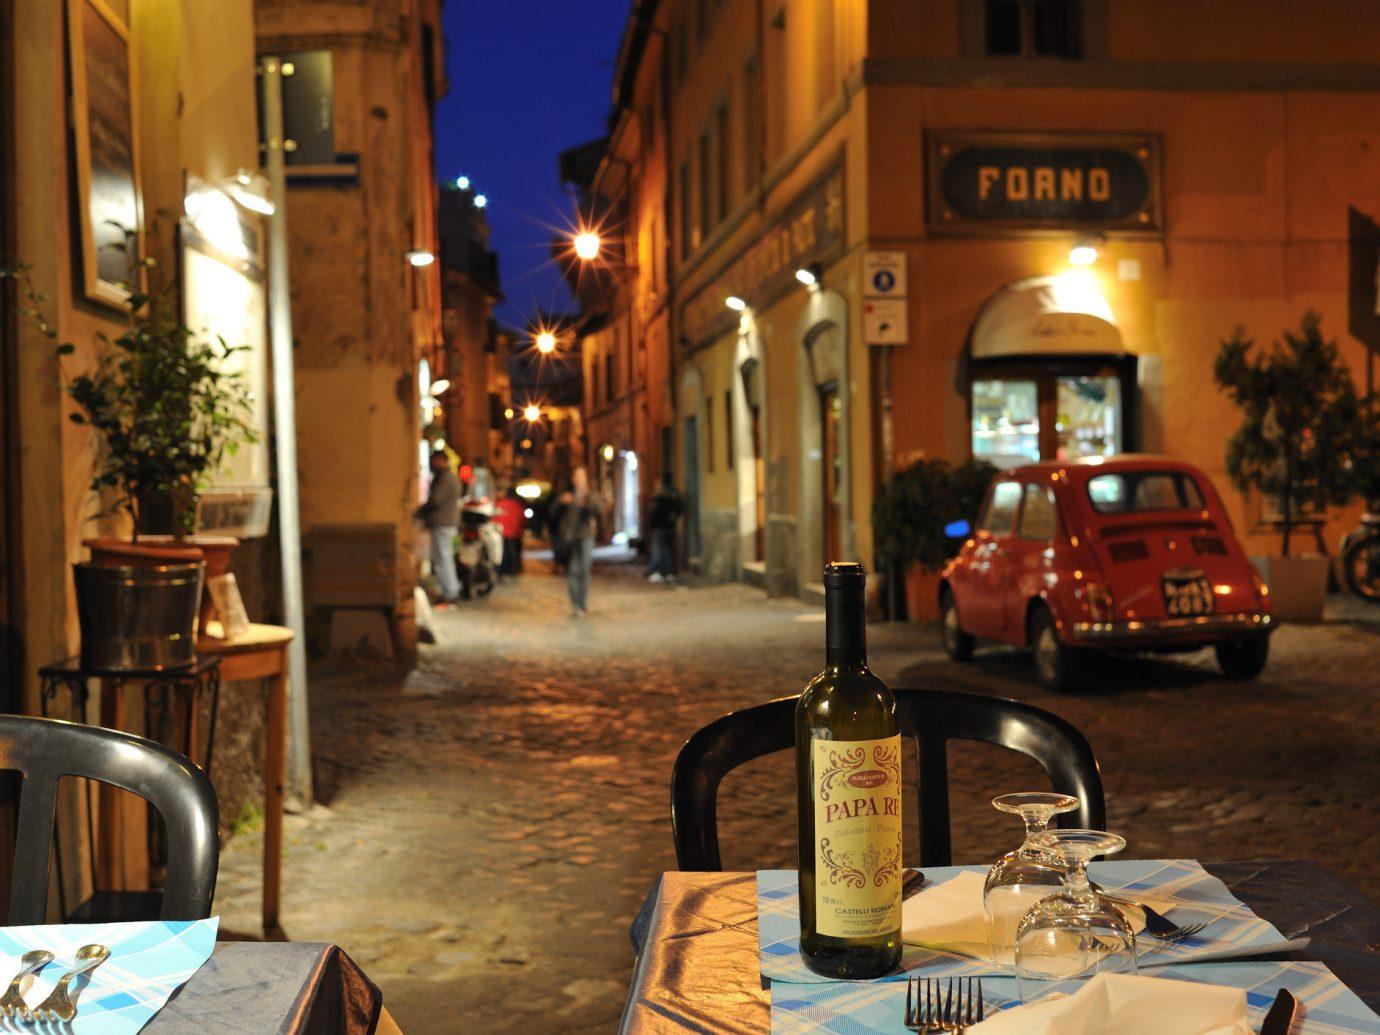 Travel Tips outdoor night street Town restaurant evening City window road